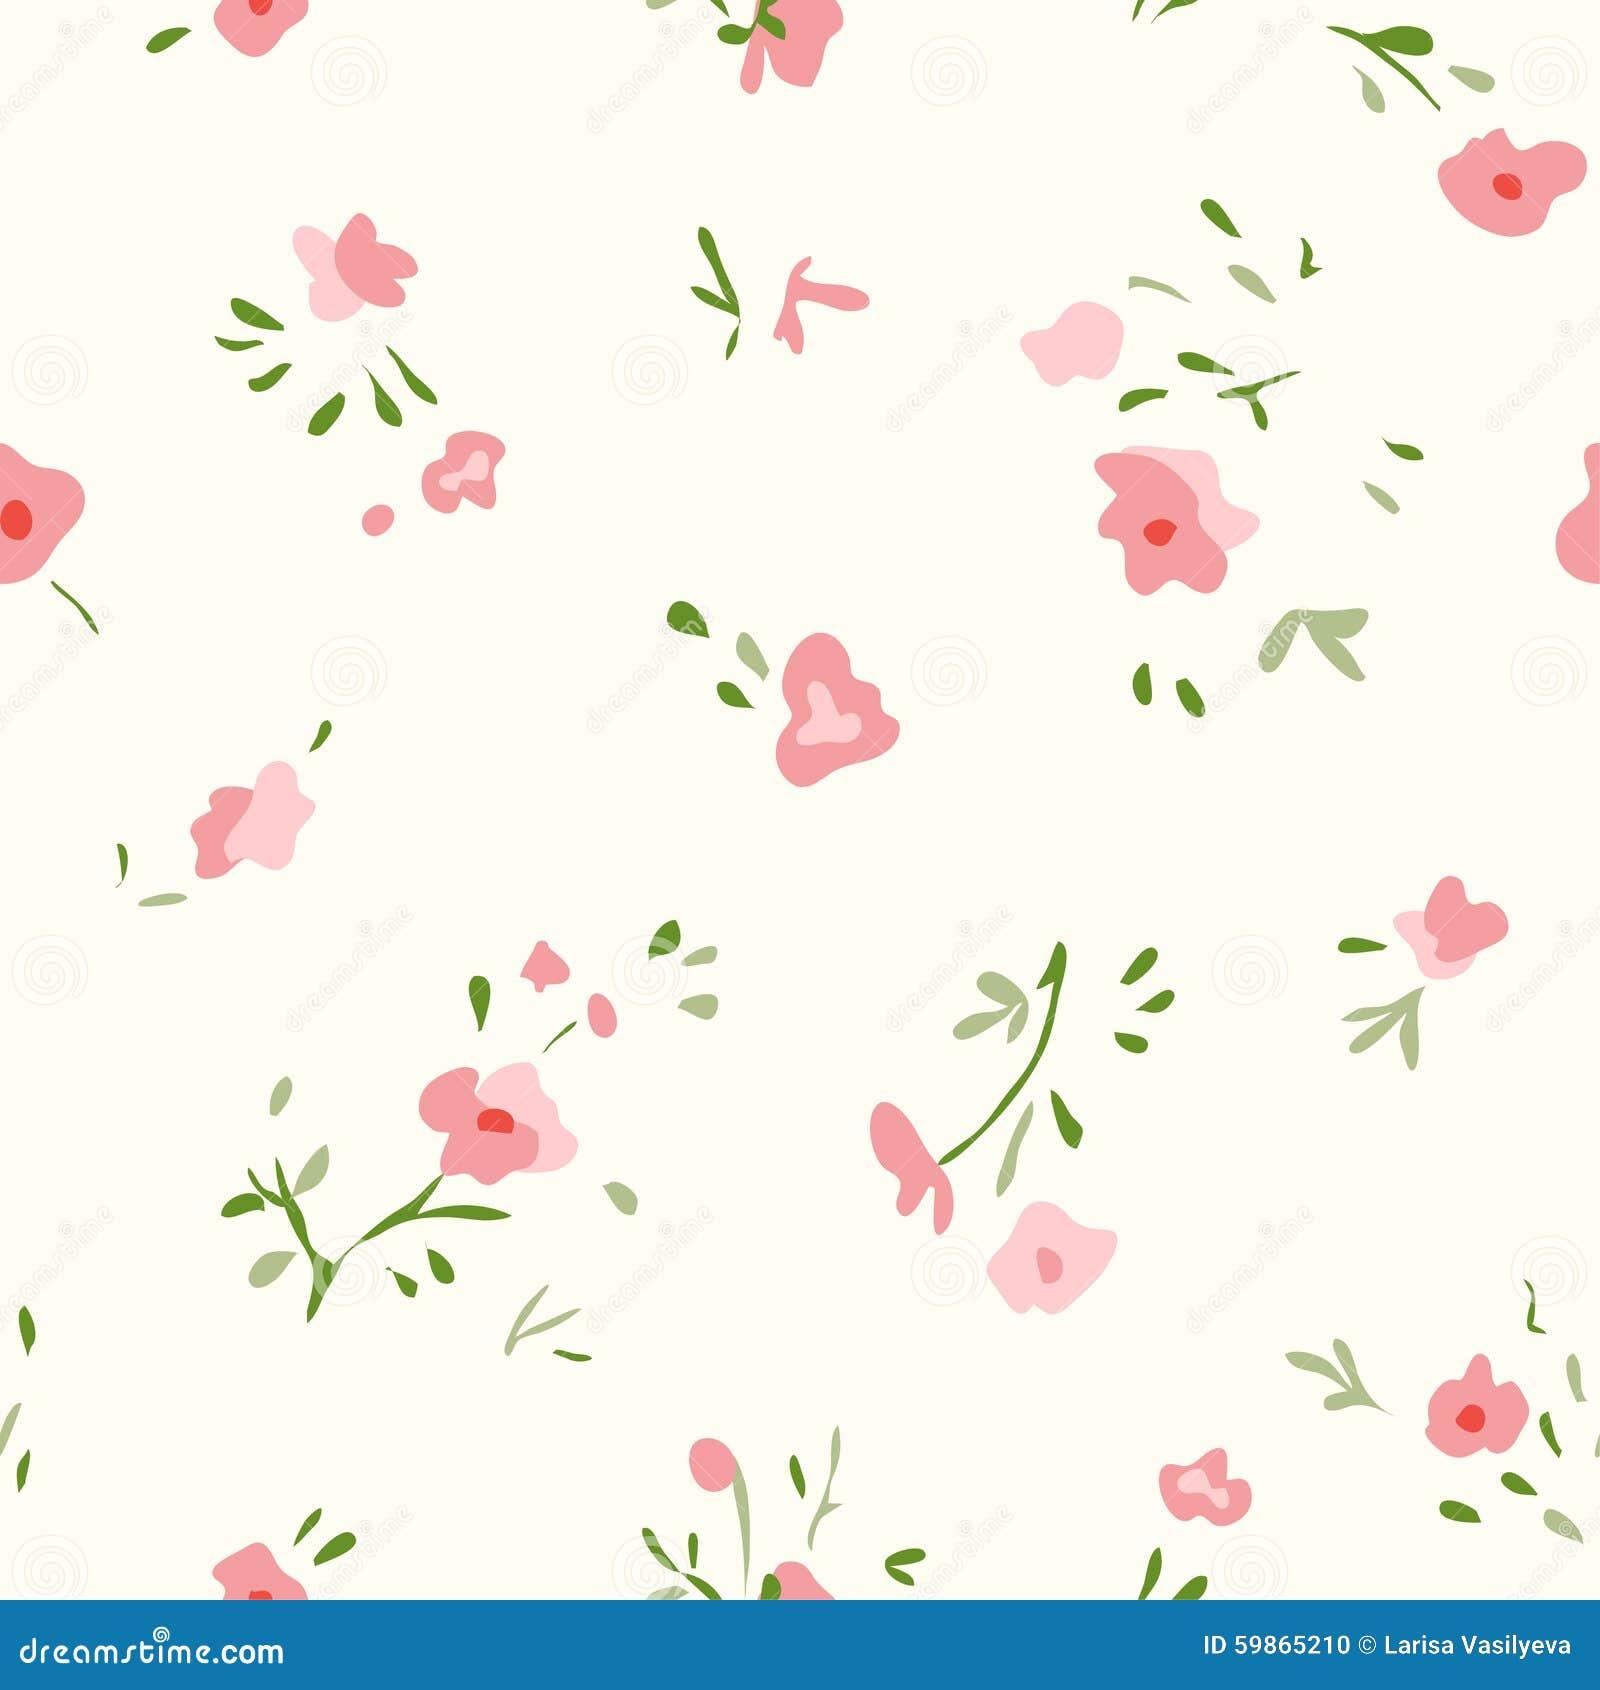 Small Flower Pattern Stock Vector. Illustration Of